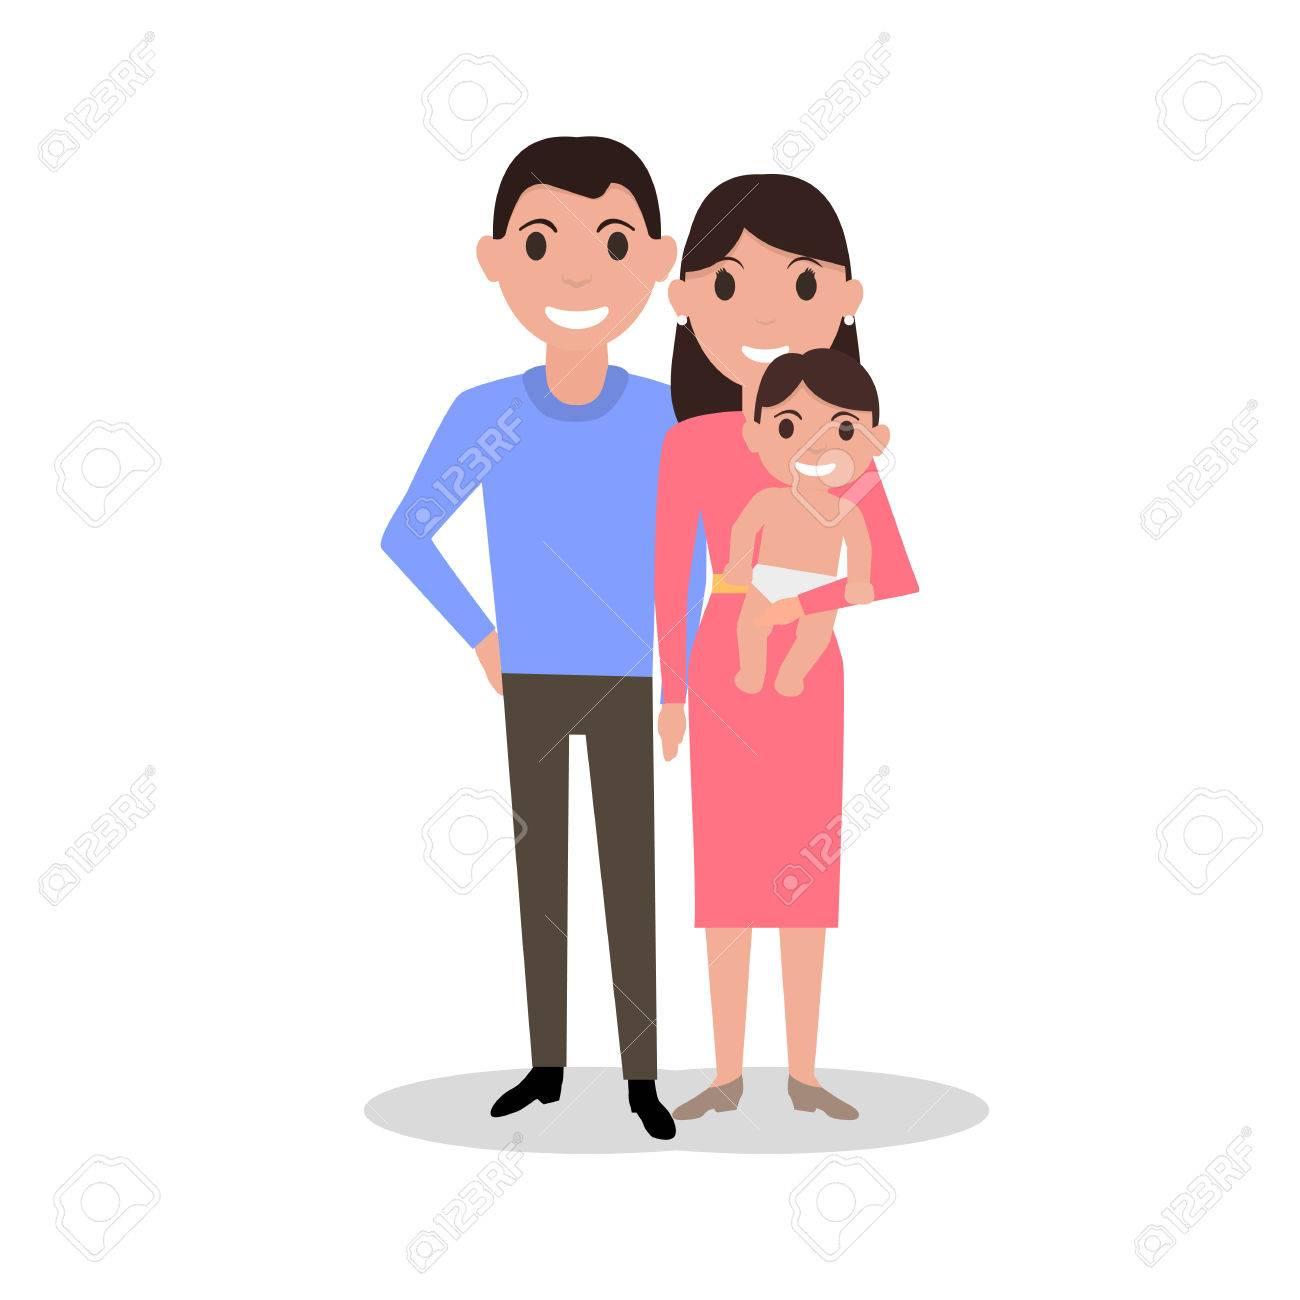 1300x1300 Vector Illustration Of A Cartoon Dear Happy Family. Drawing